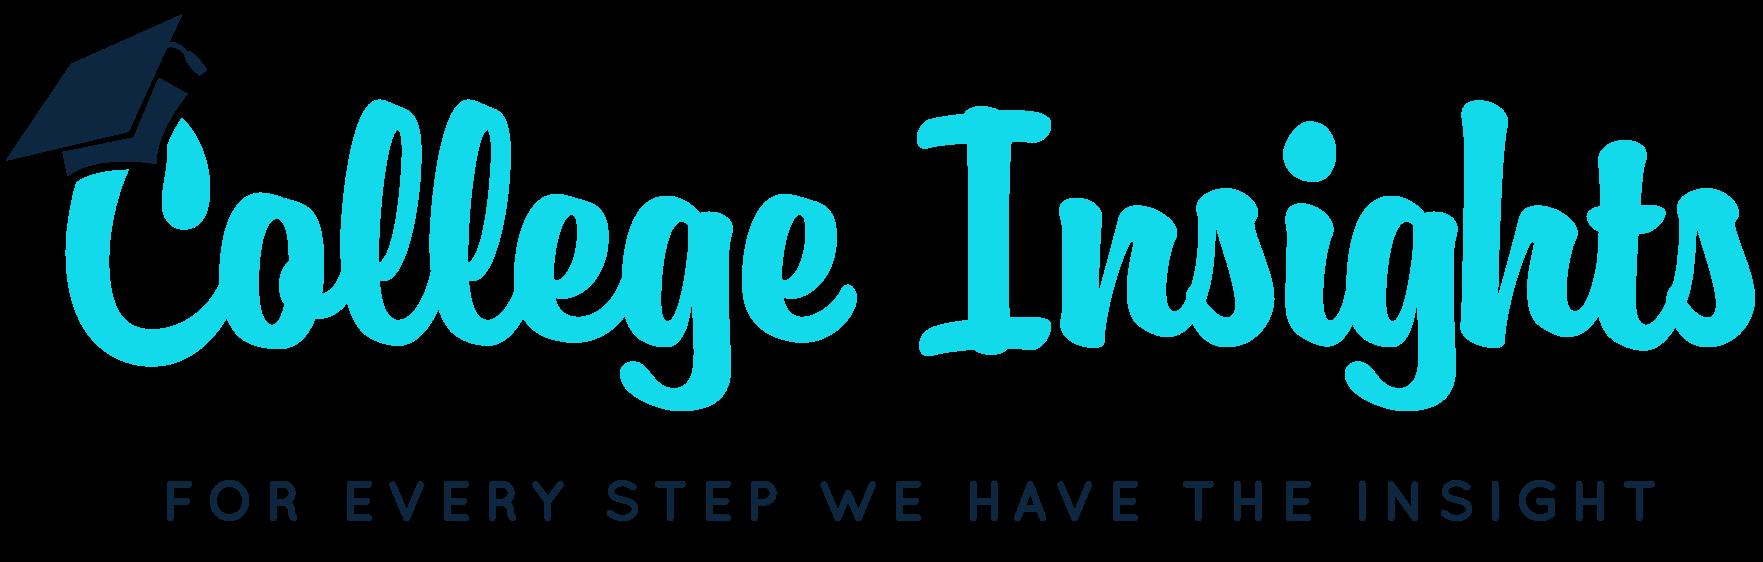 college-insights-logo-1